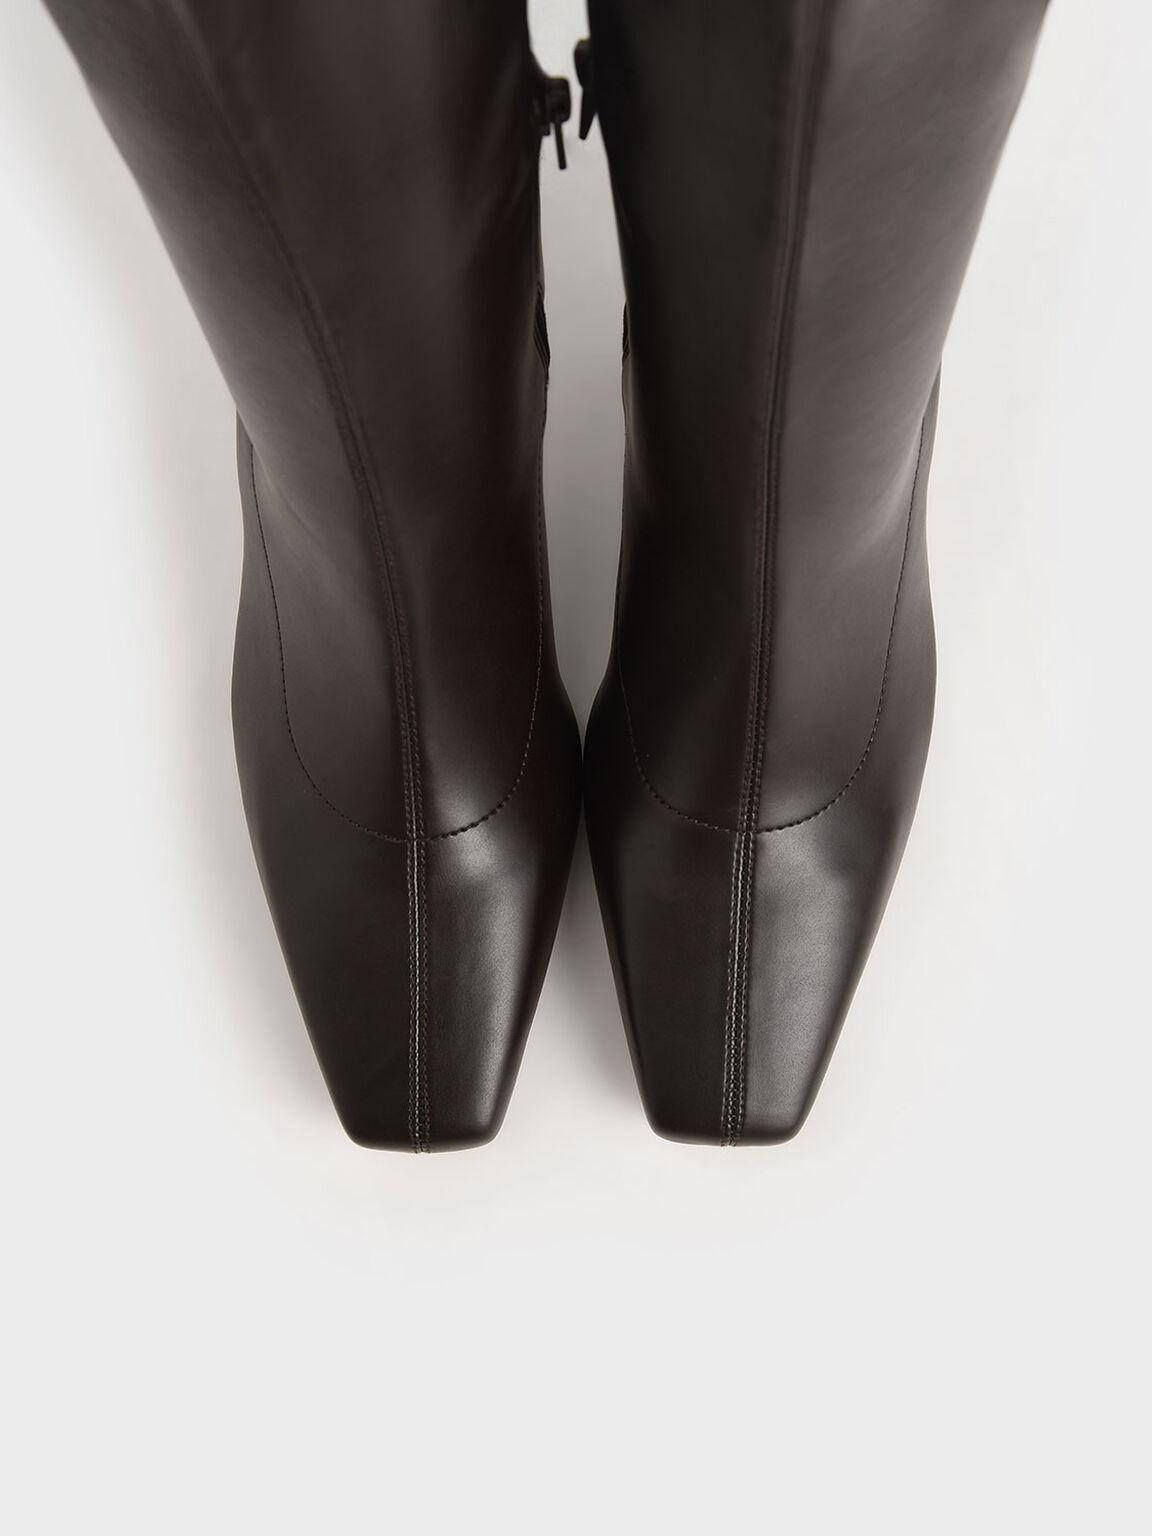 Spool Heel Calf Boots, Dark Brown, hi-res